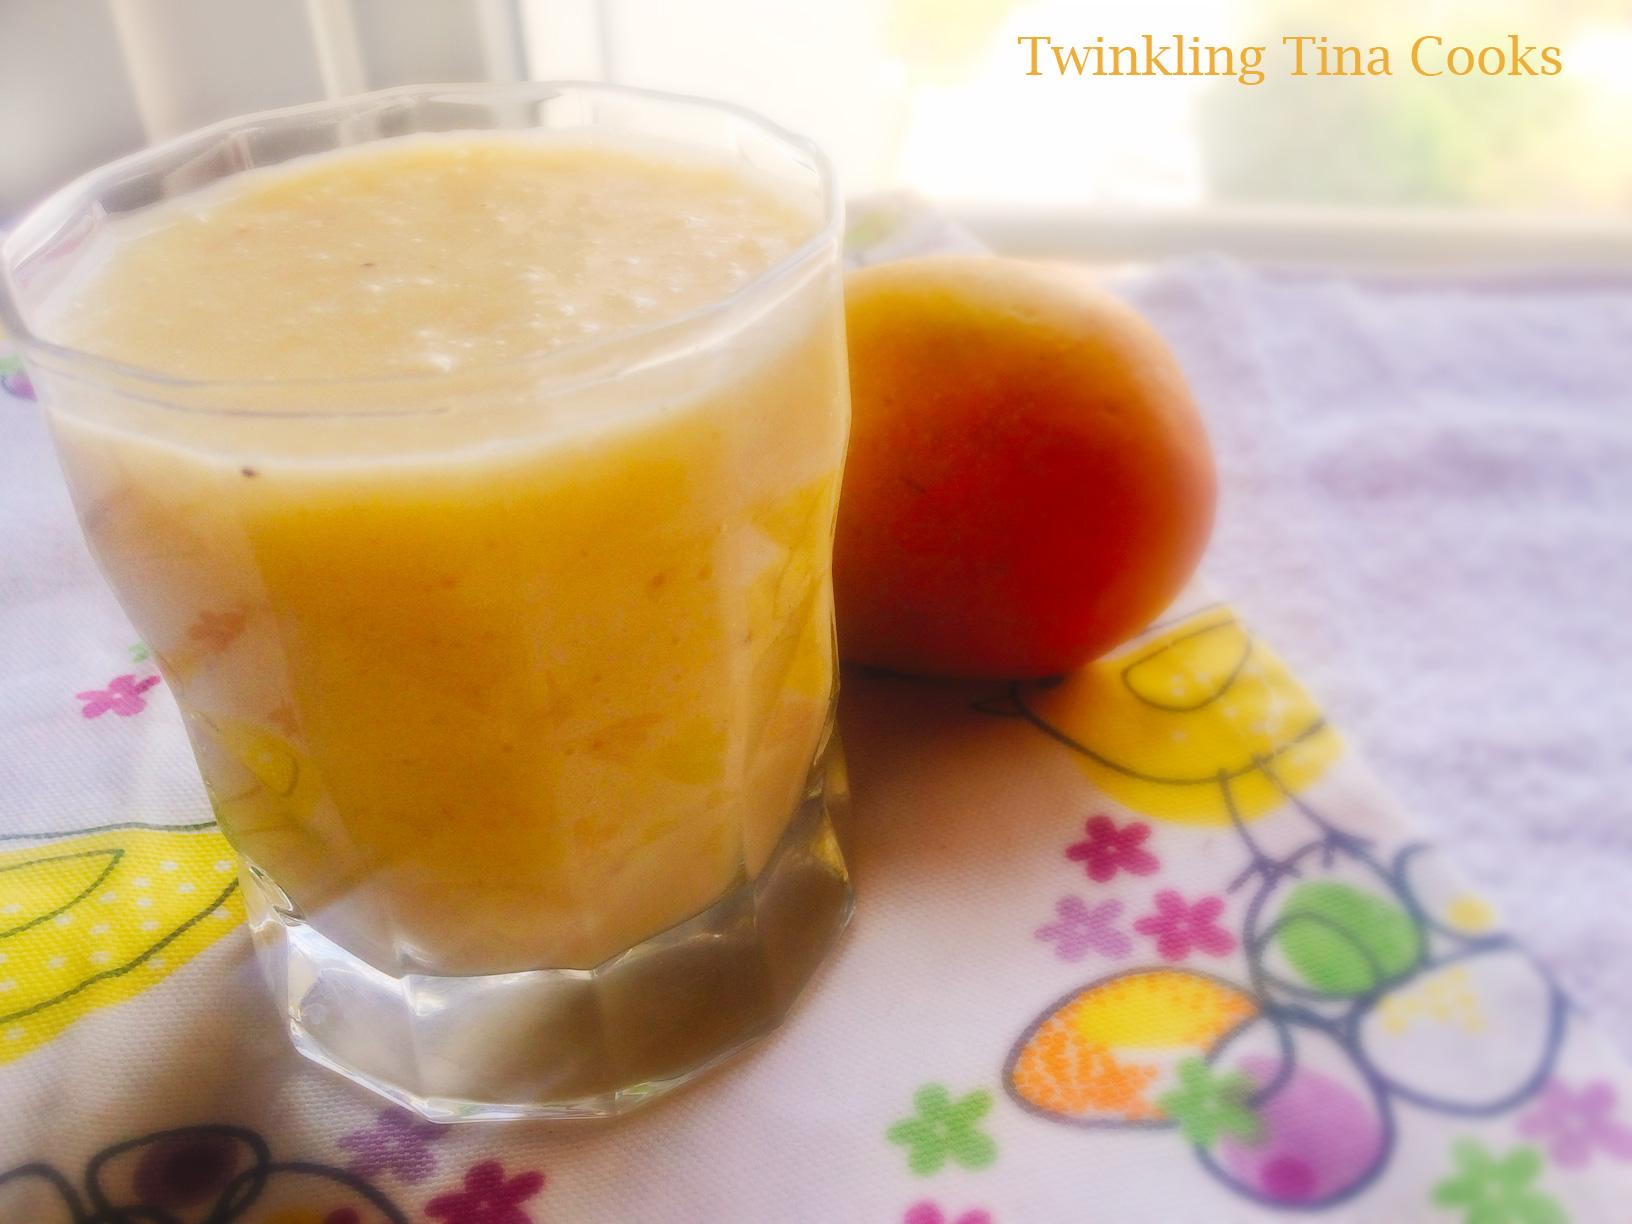 mango banana smoothie, smoothie recipe, blender smoothie, healthy smoothie